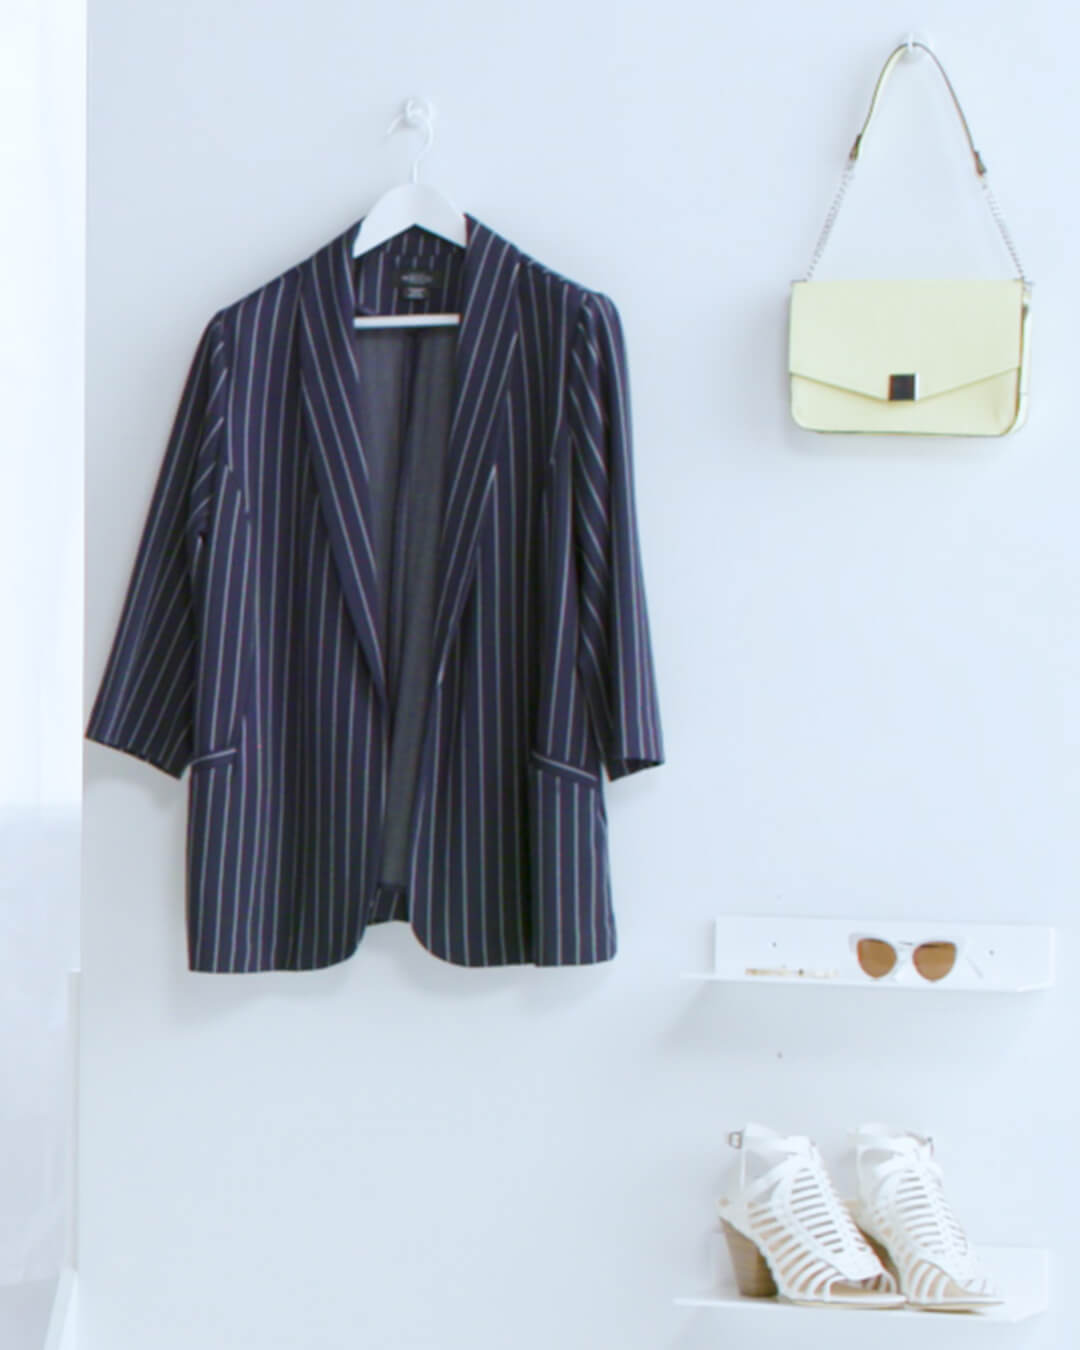 plus-size blazer pinstripe